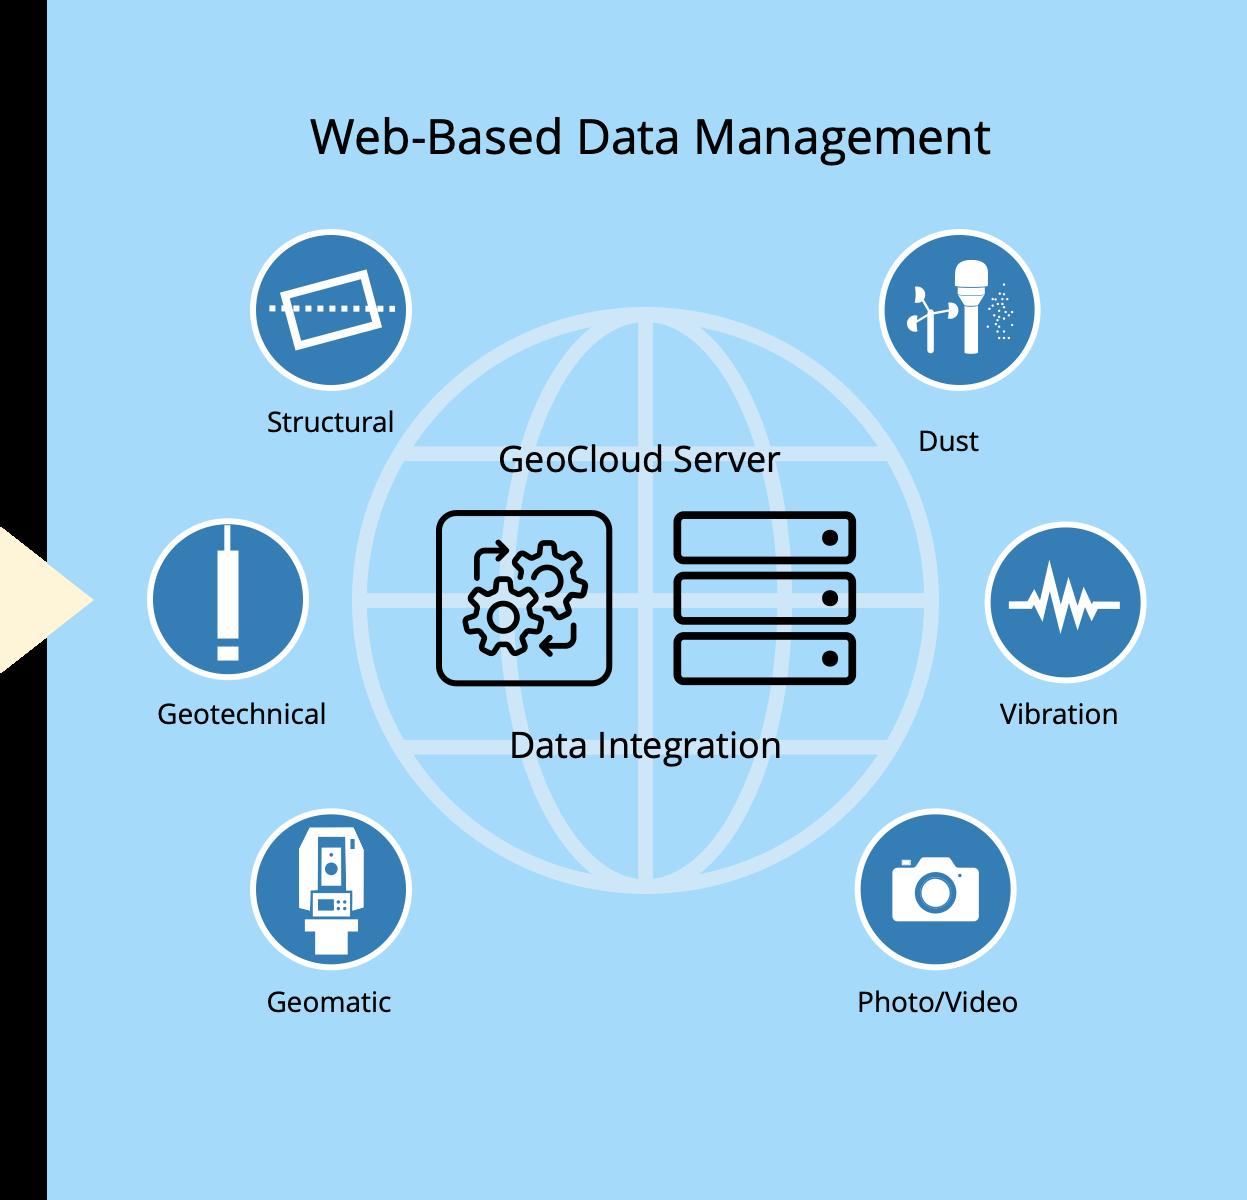 GeoCloud Services - Web-Based Data Management